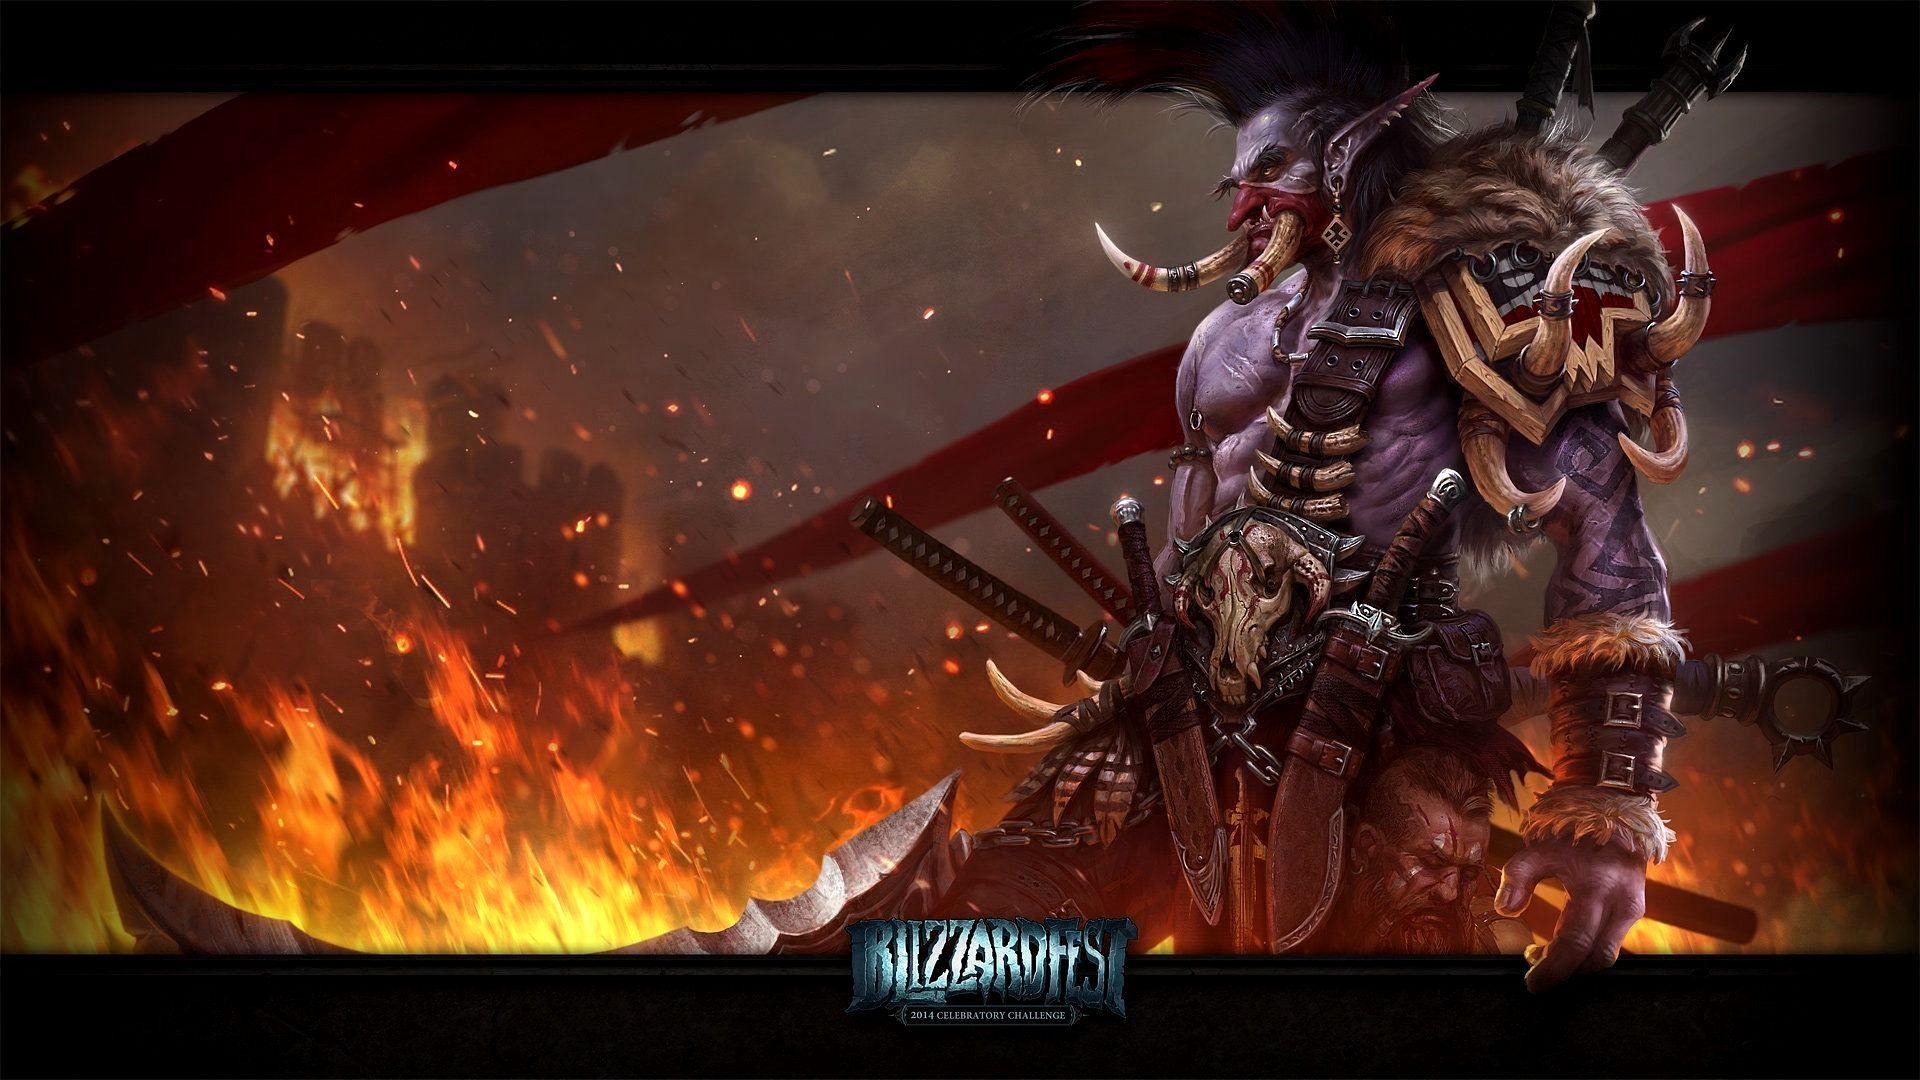 Wallpaper 4k Warcraft Gallery 4k In 2020 World Of Warcraft Wallpaper Warcraft Wow Shaman